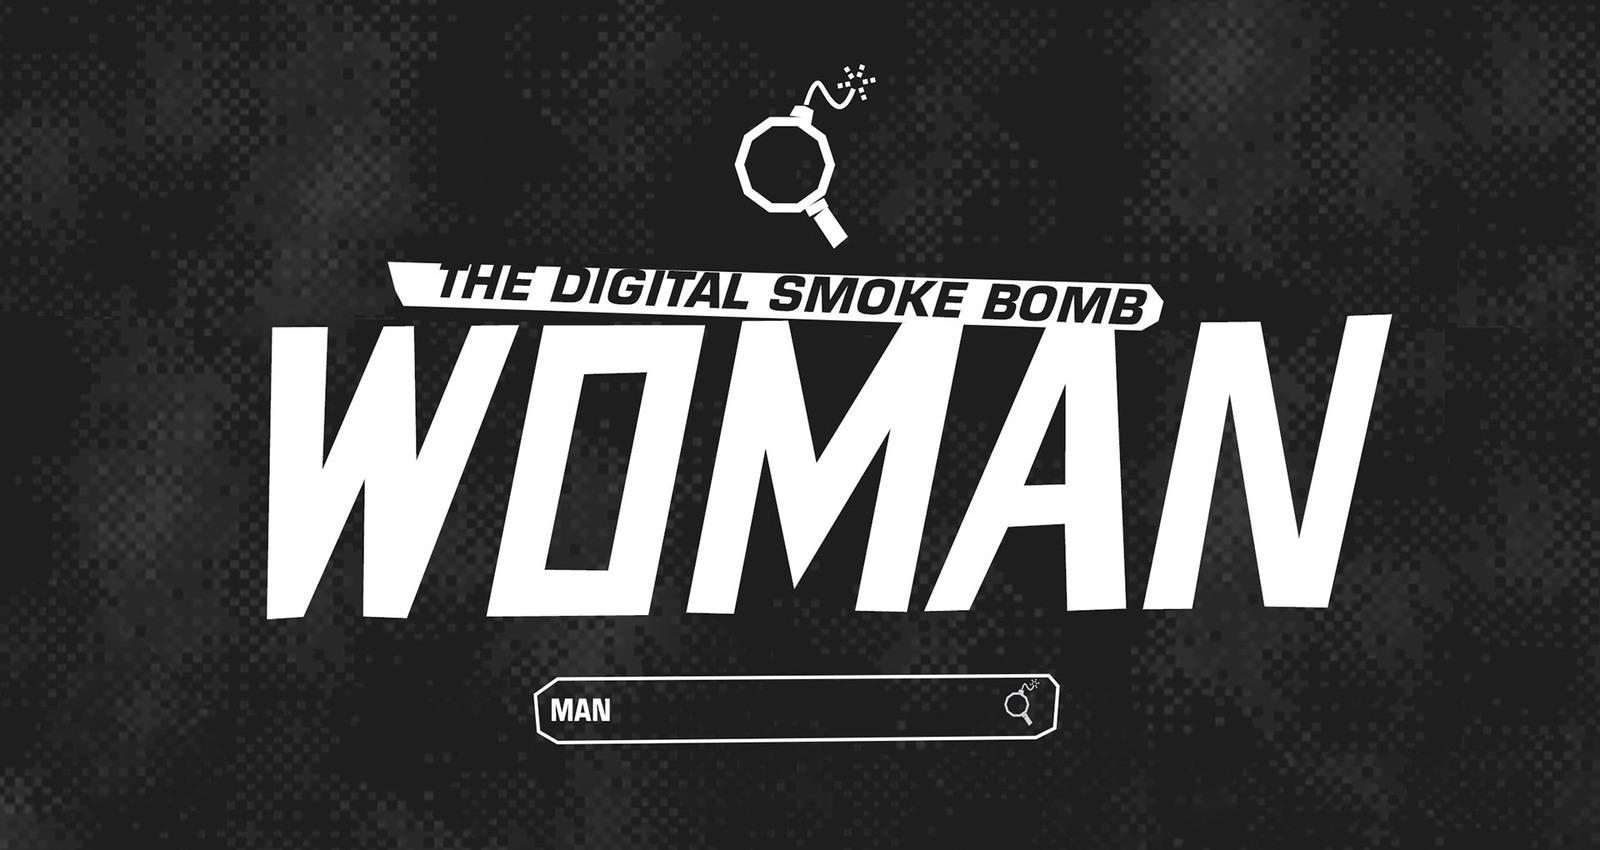 Antonymous - the Digital Smoke Bomb